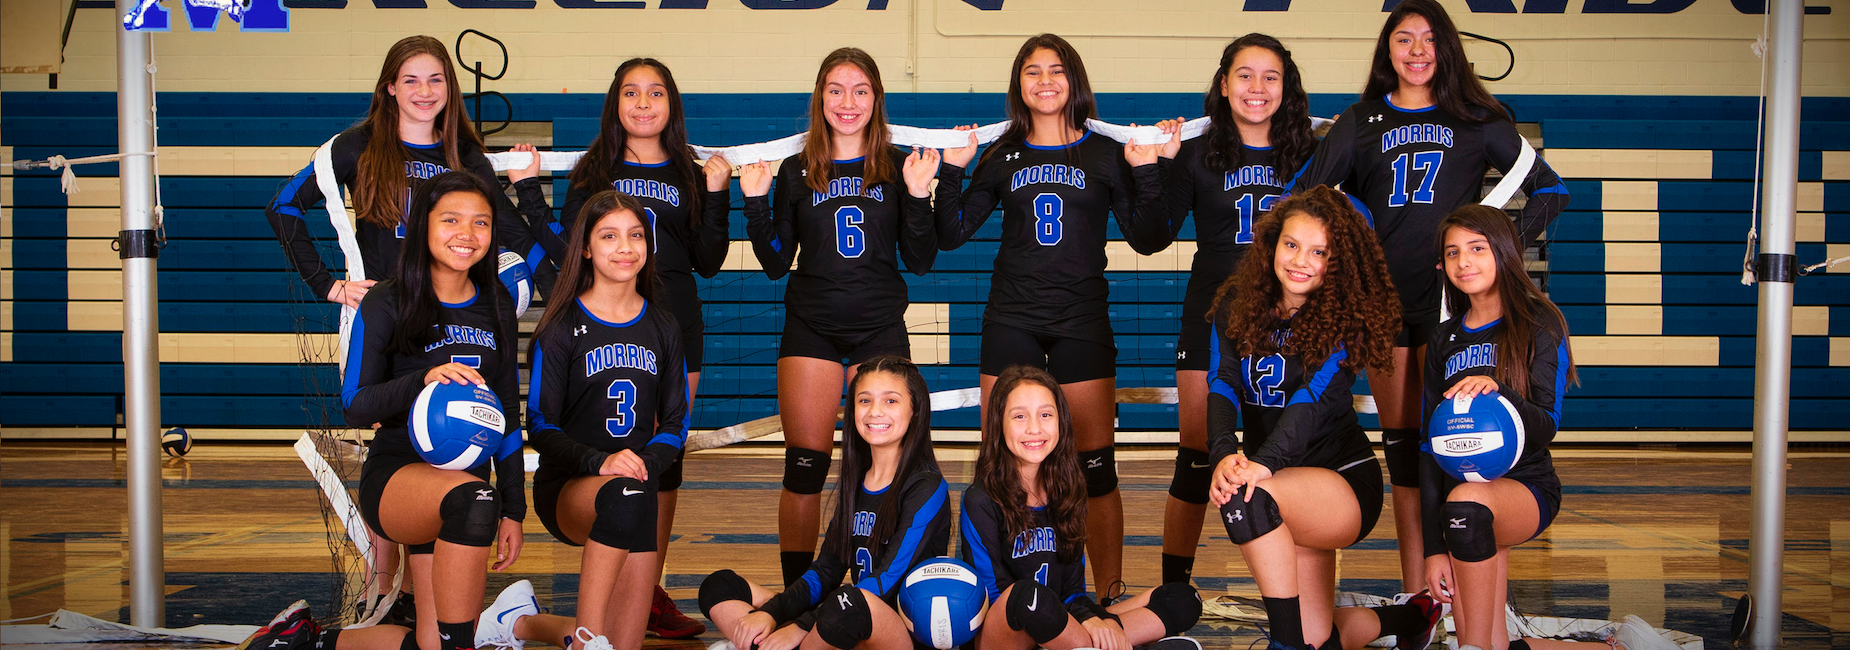 7th Grade Dark Volleyball -- District Champions